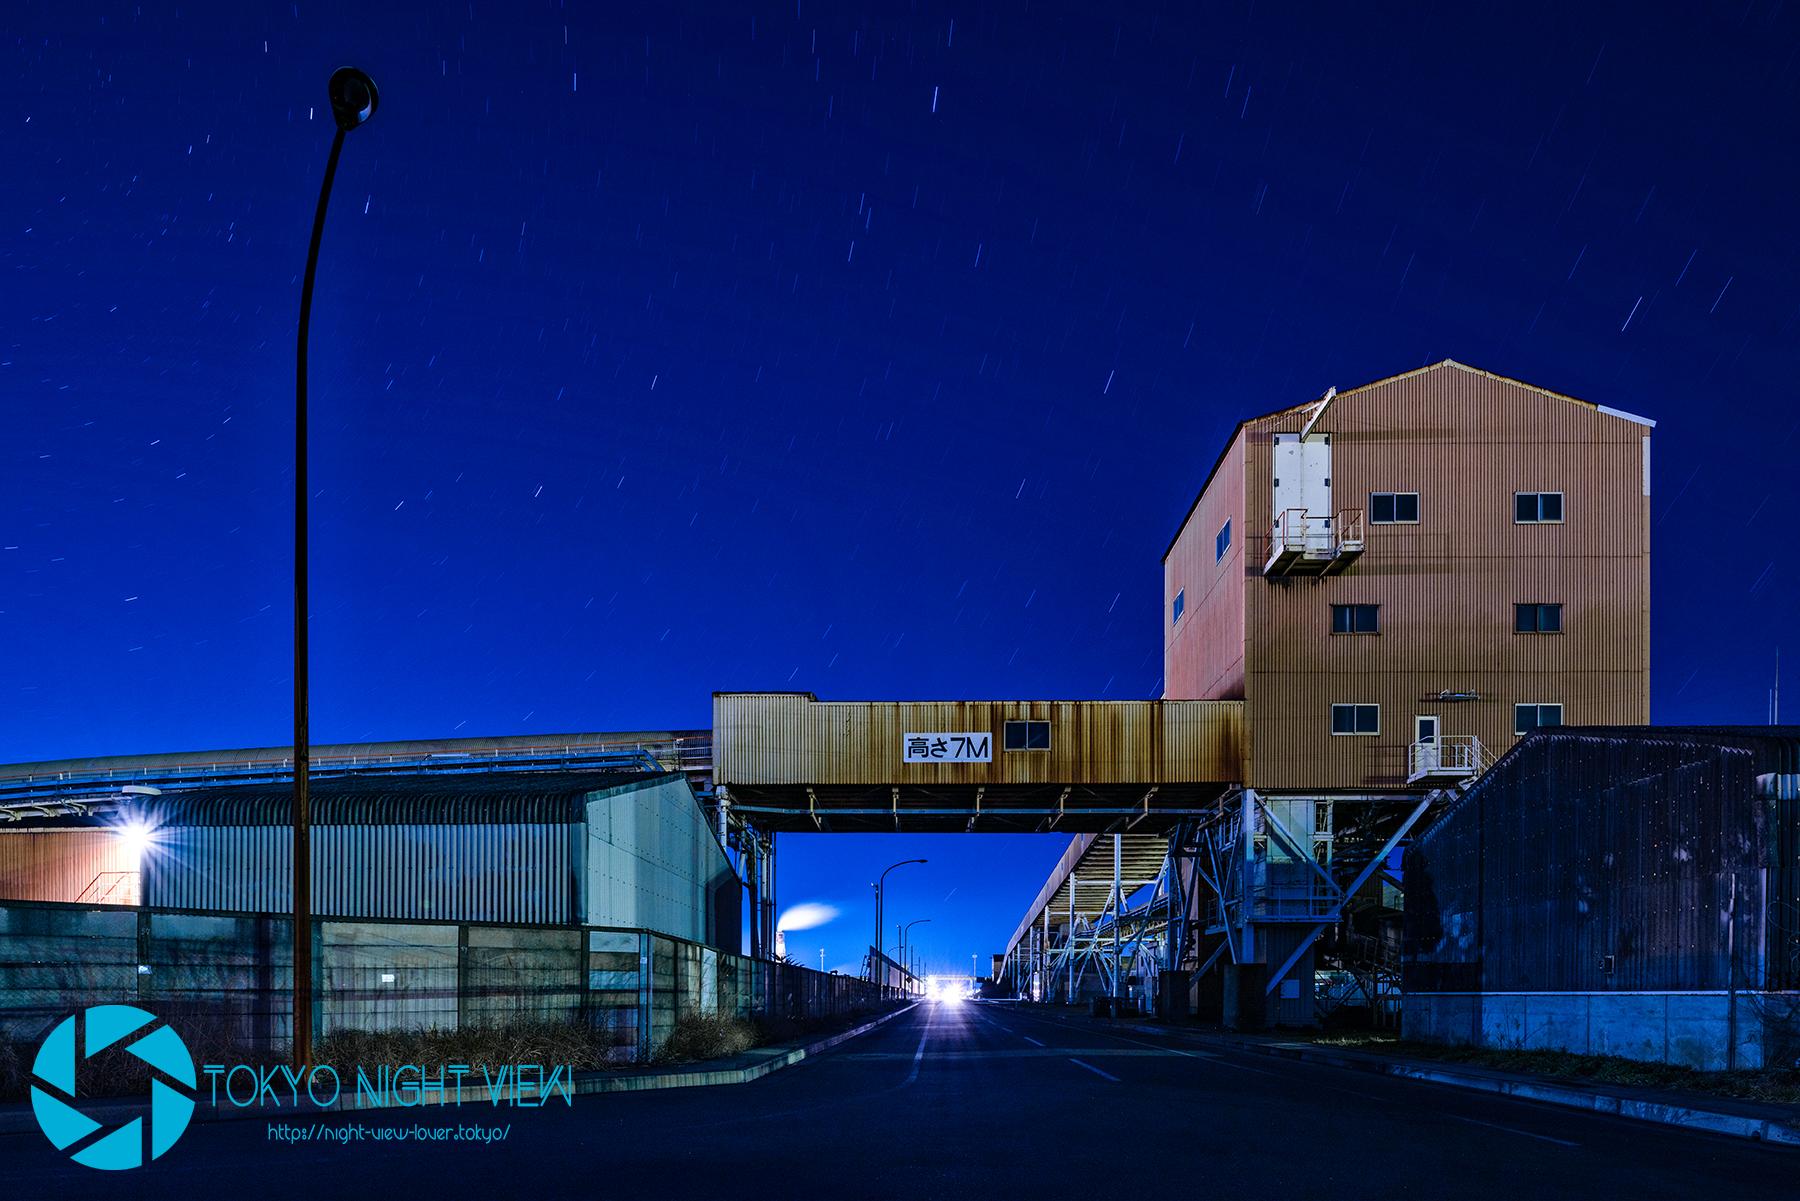 工場風景-Factory landscape